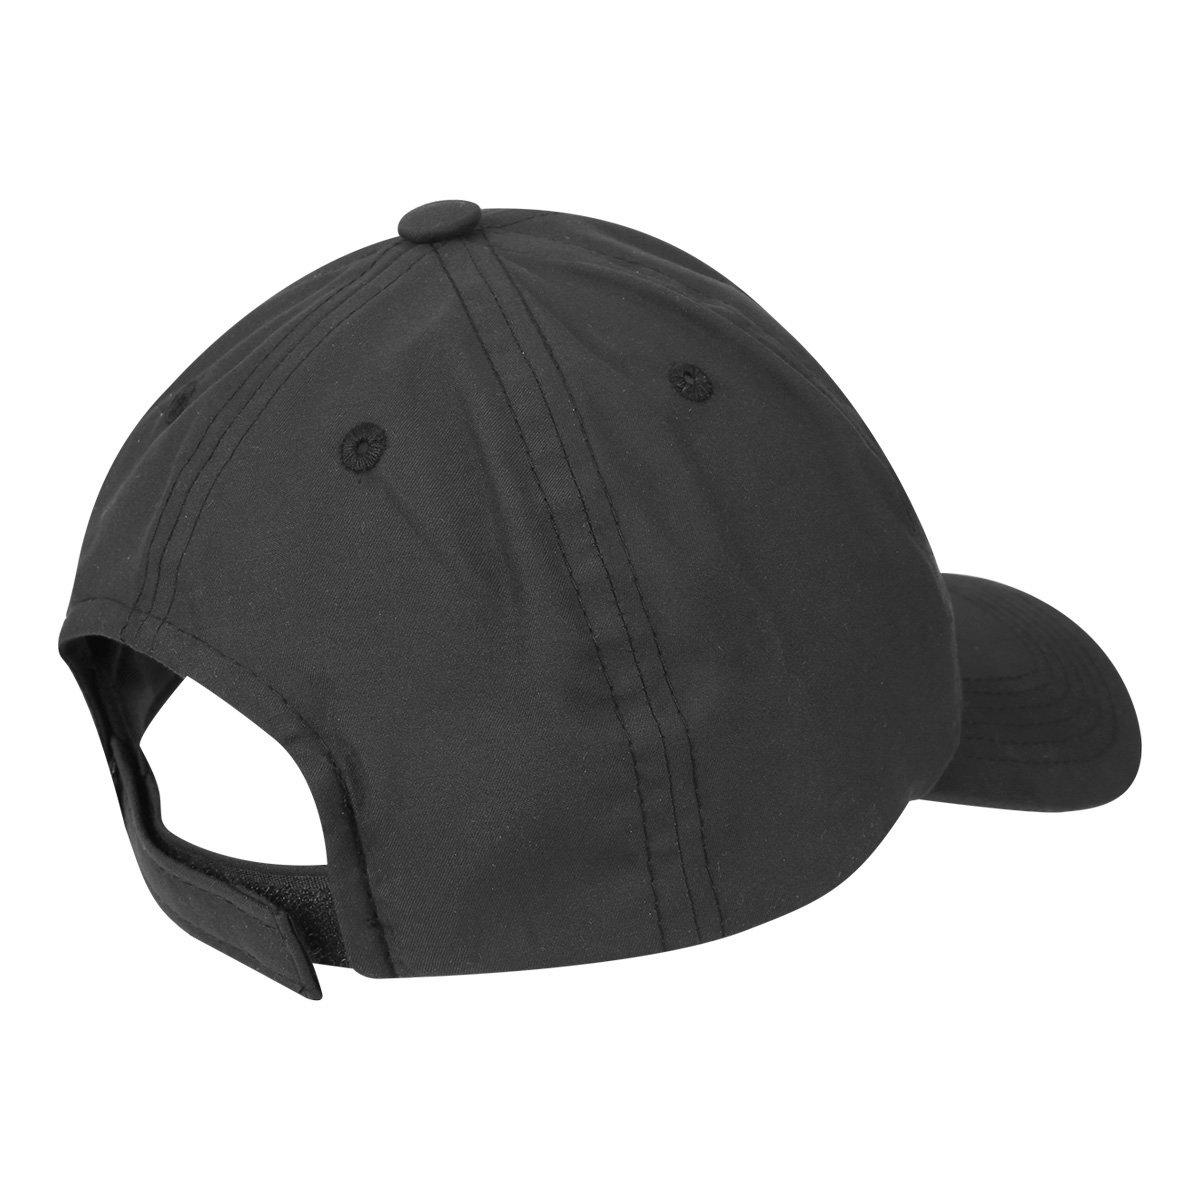 Boné Quiksilver Aba Curva Ass Basic Masculino - Compre Agora   Netshoes 88e4f75b7e